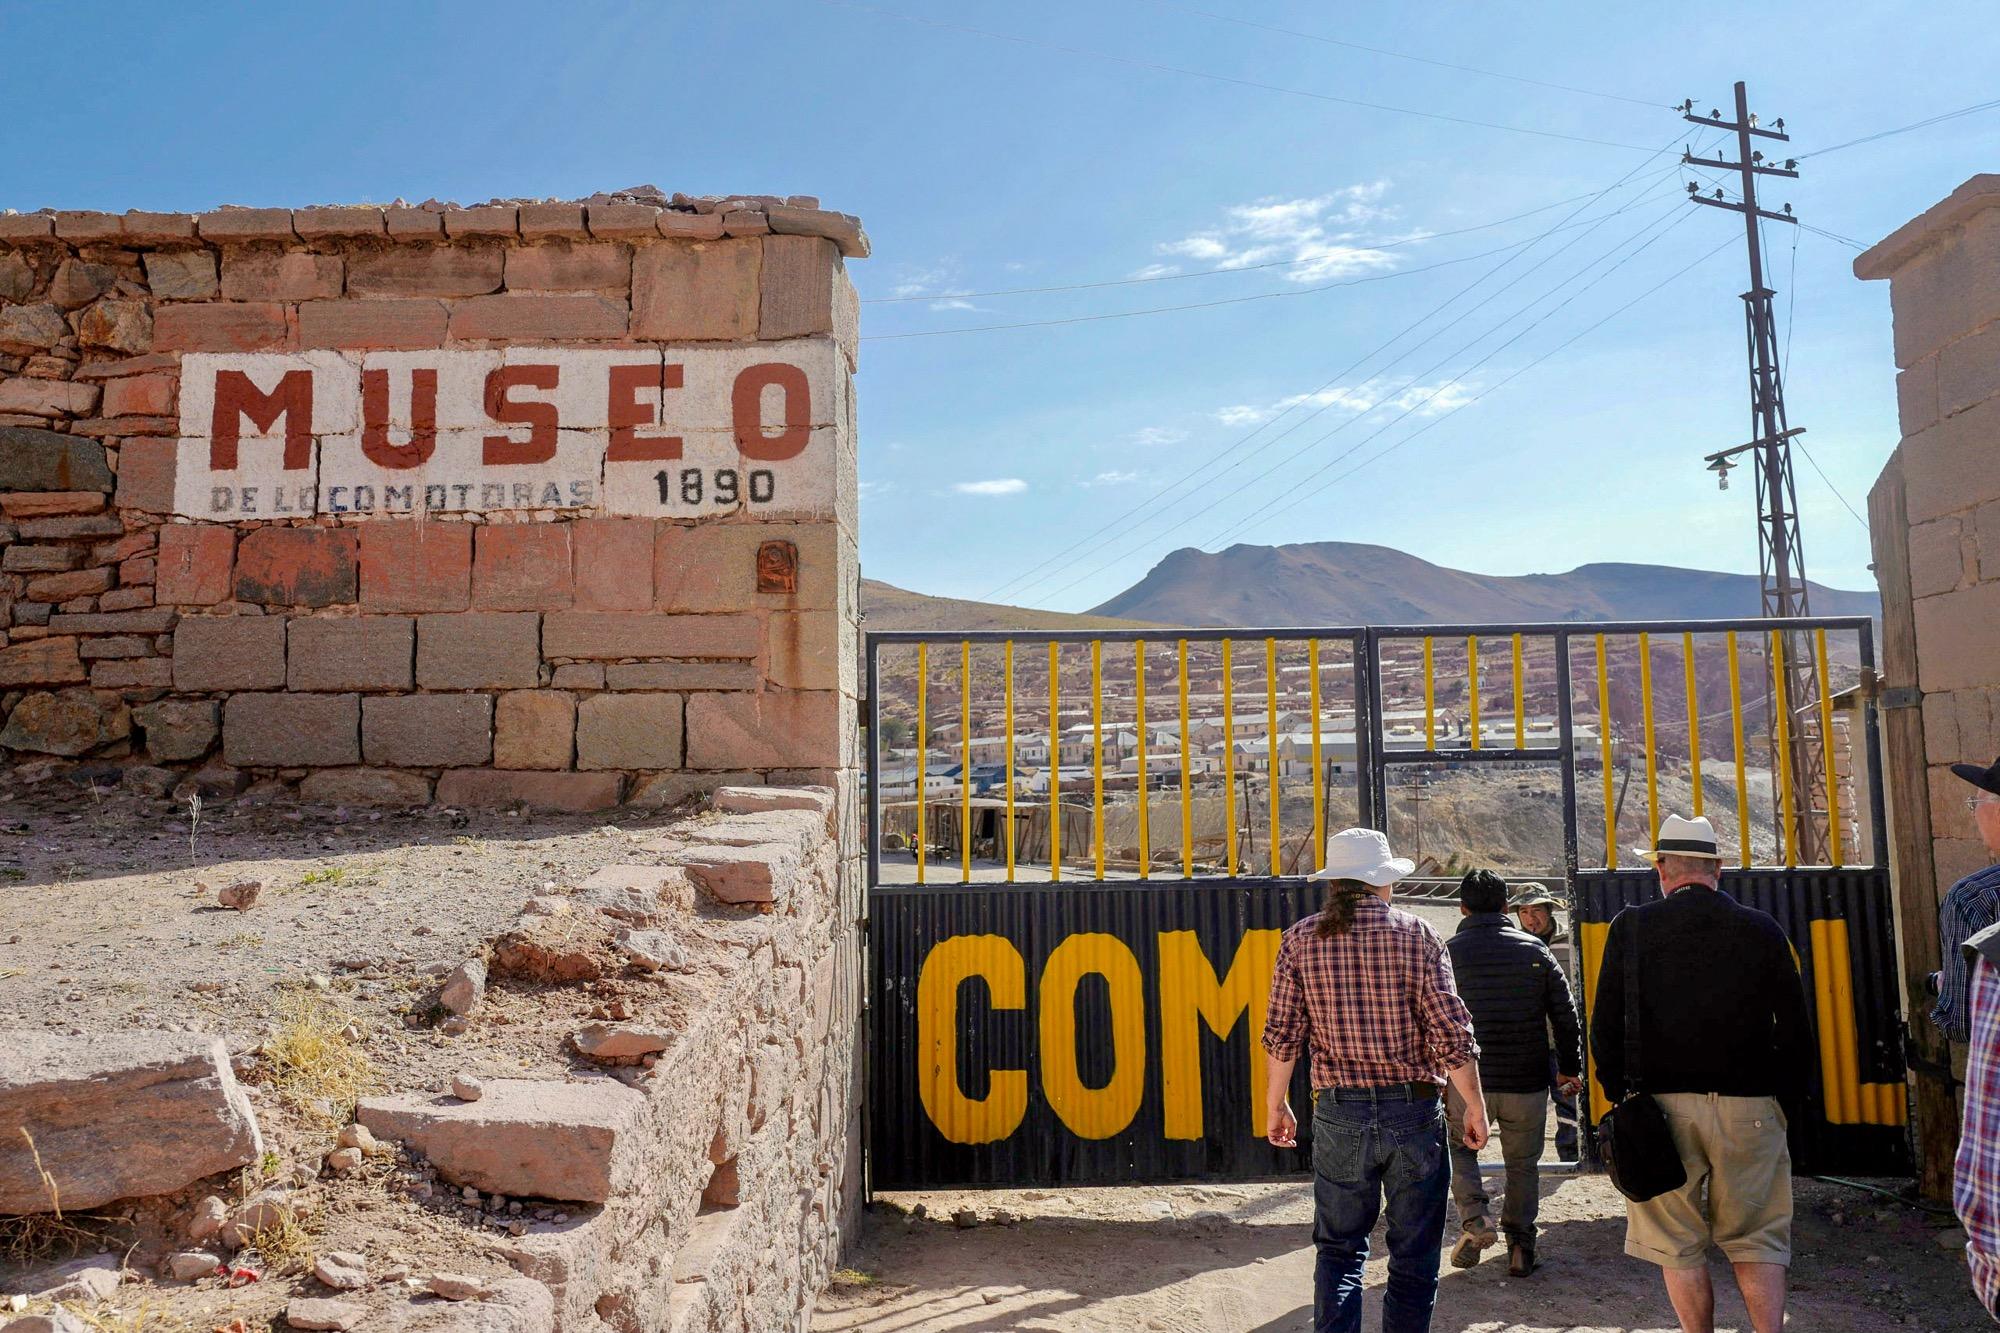 Entrance to the Pulacayo Mining City